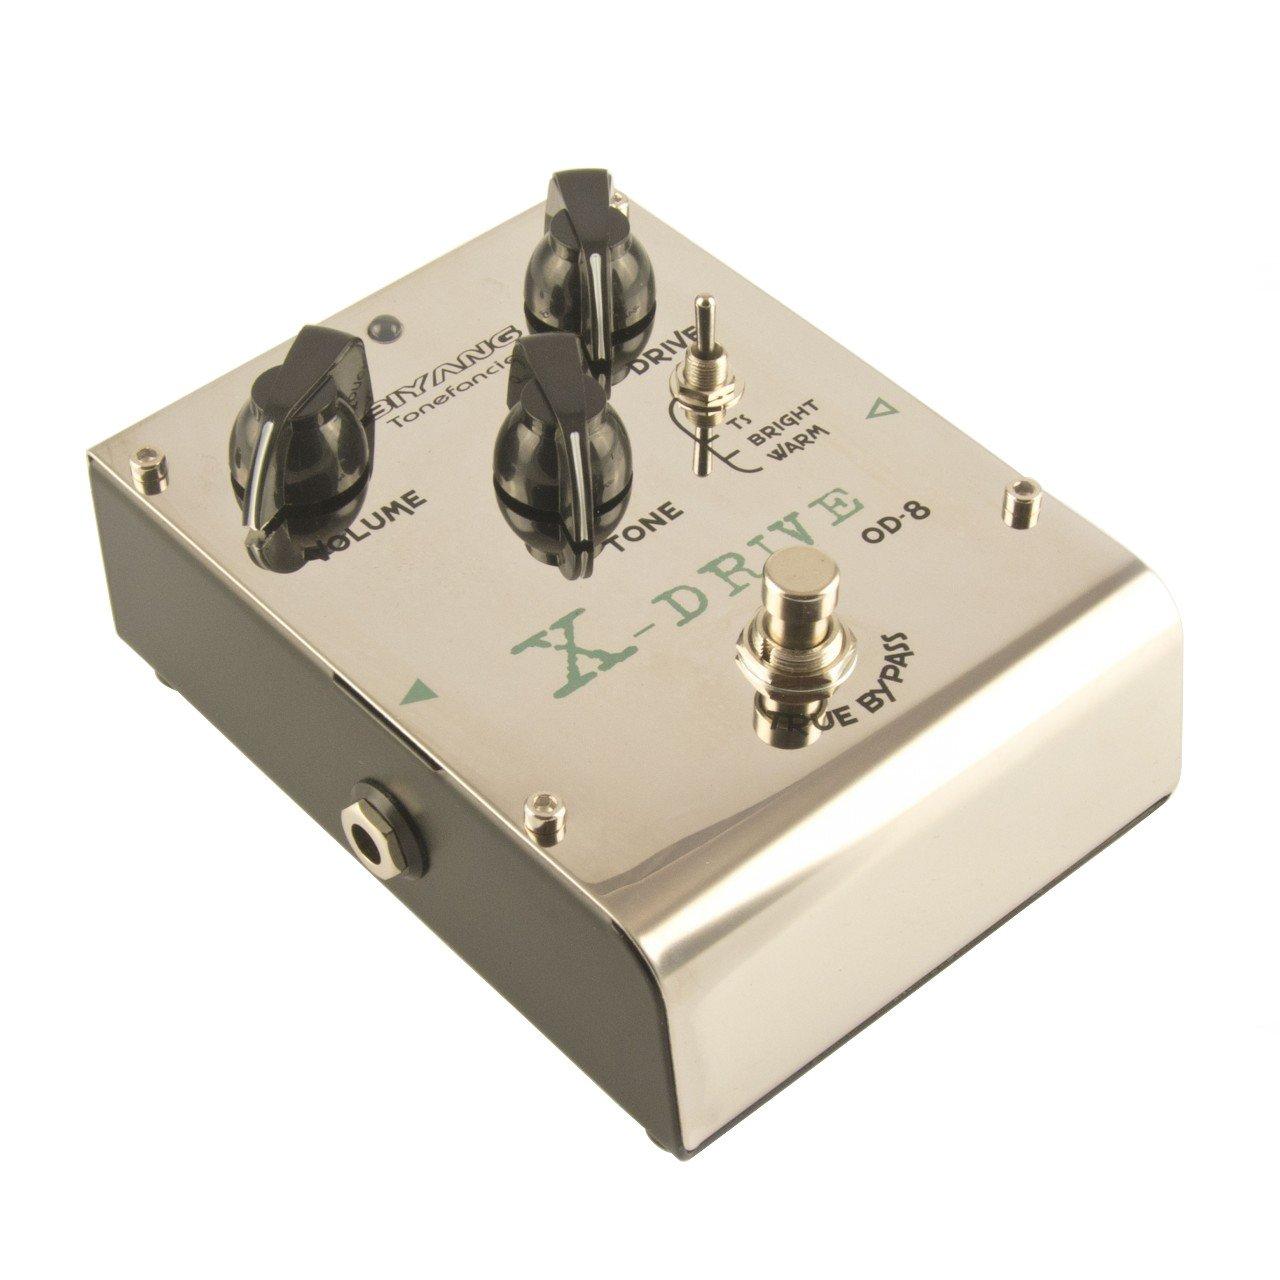 Biyang OD8 Tubescreamer Clone Overdrive-Pedal (inkl. 3 Wechselchips) OD-8